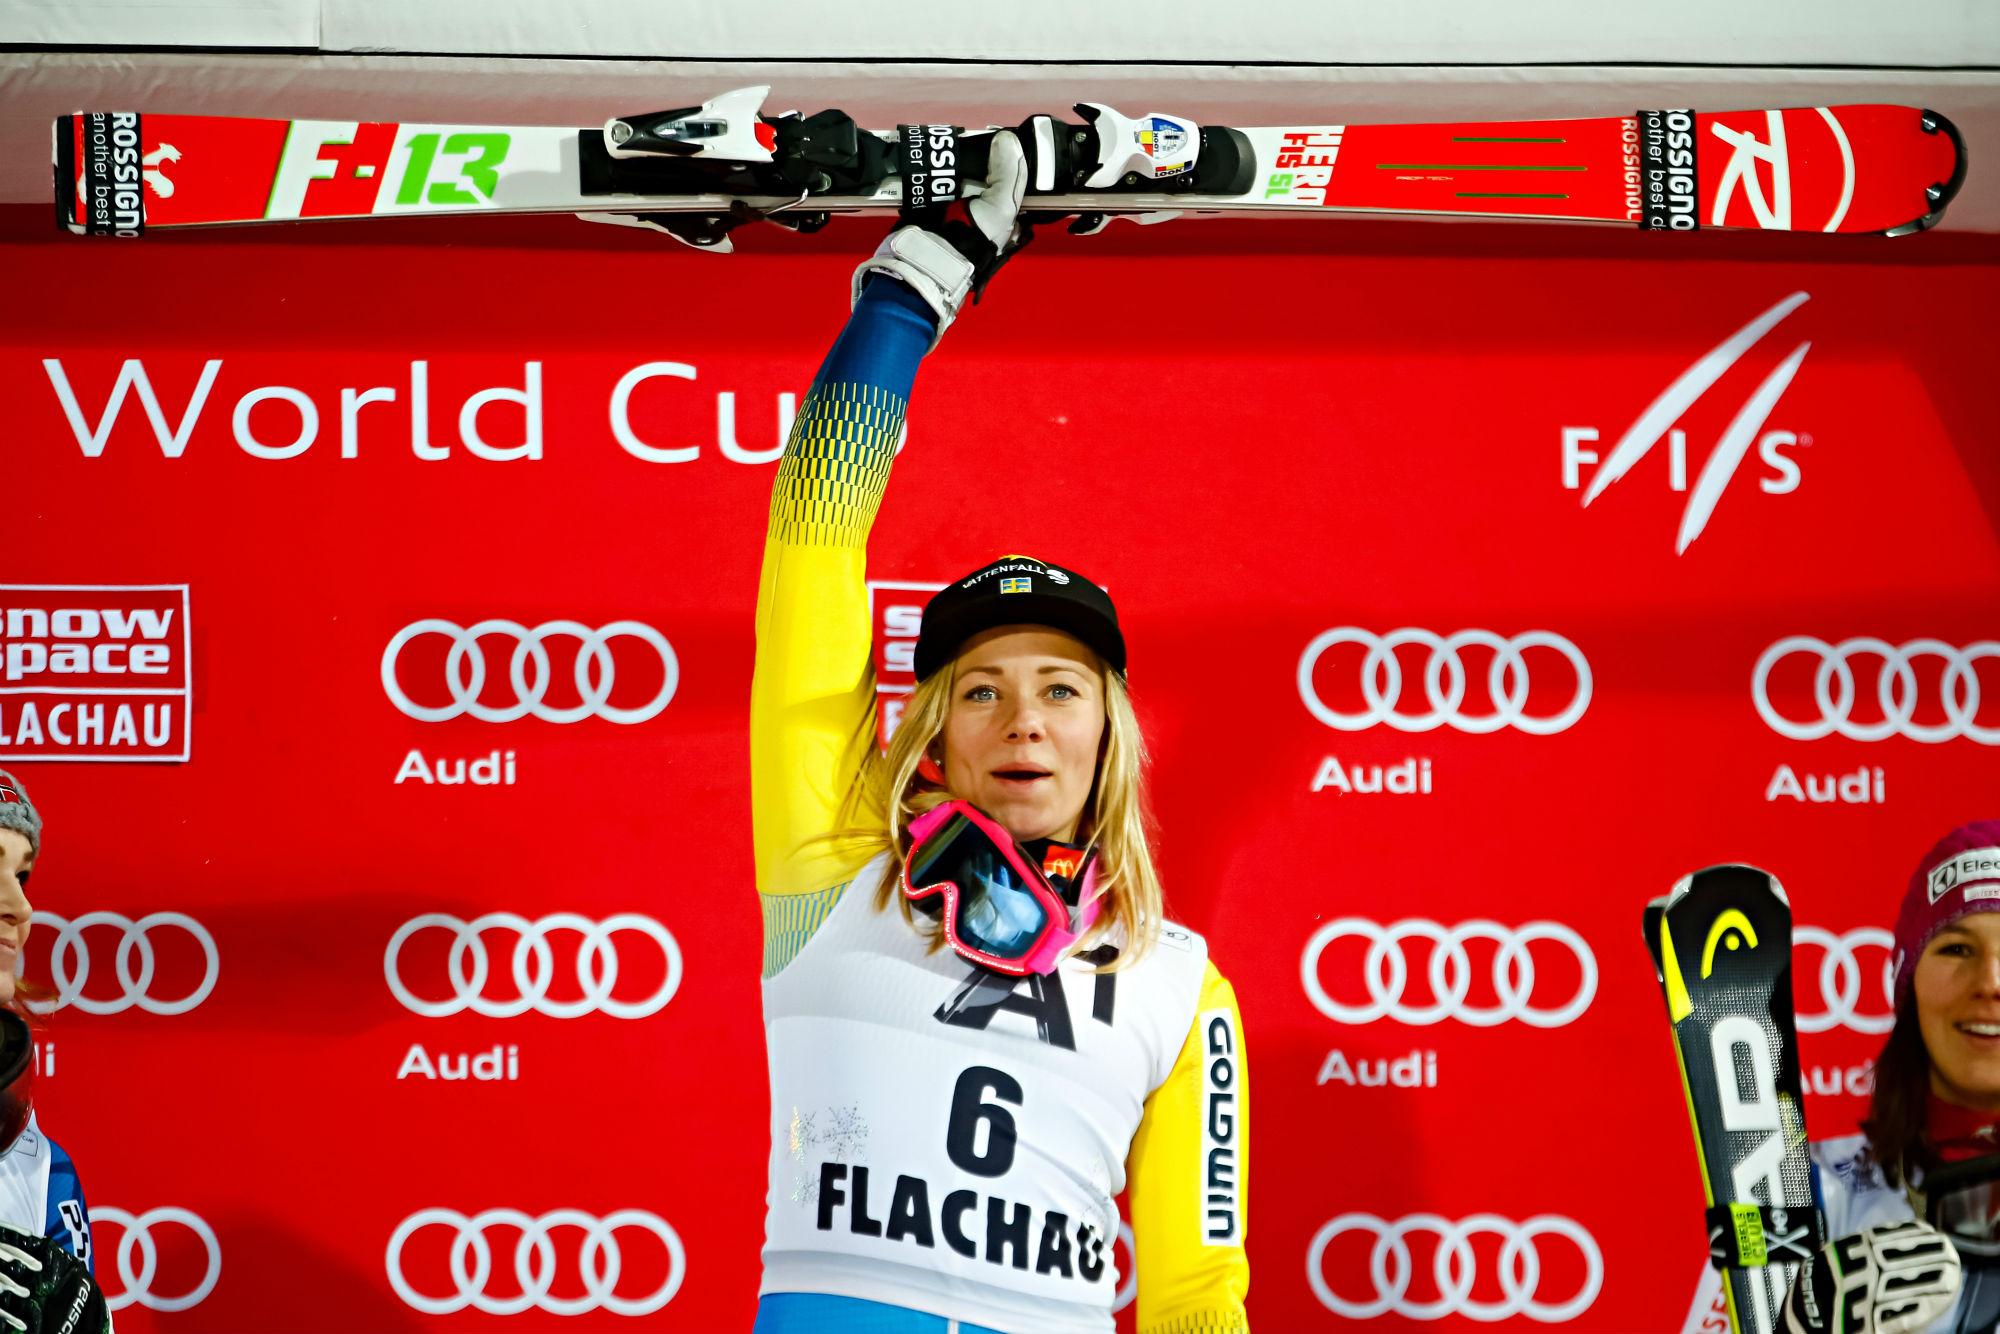 Frida Hansdotter in trionfo a Flachau (@Zoom agence)